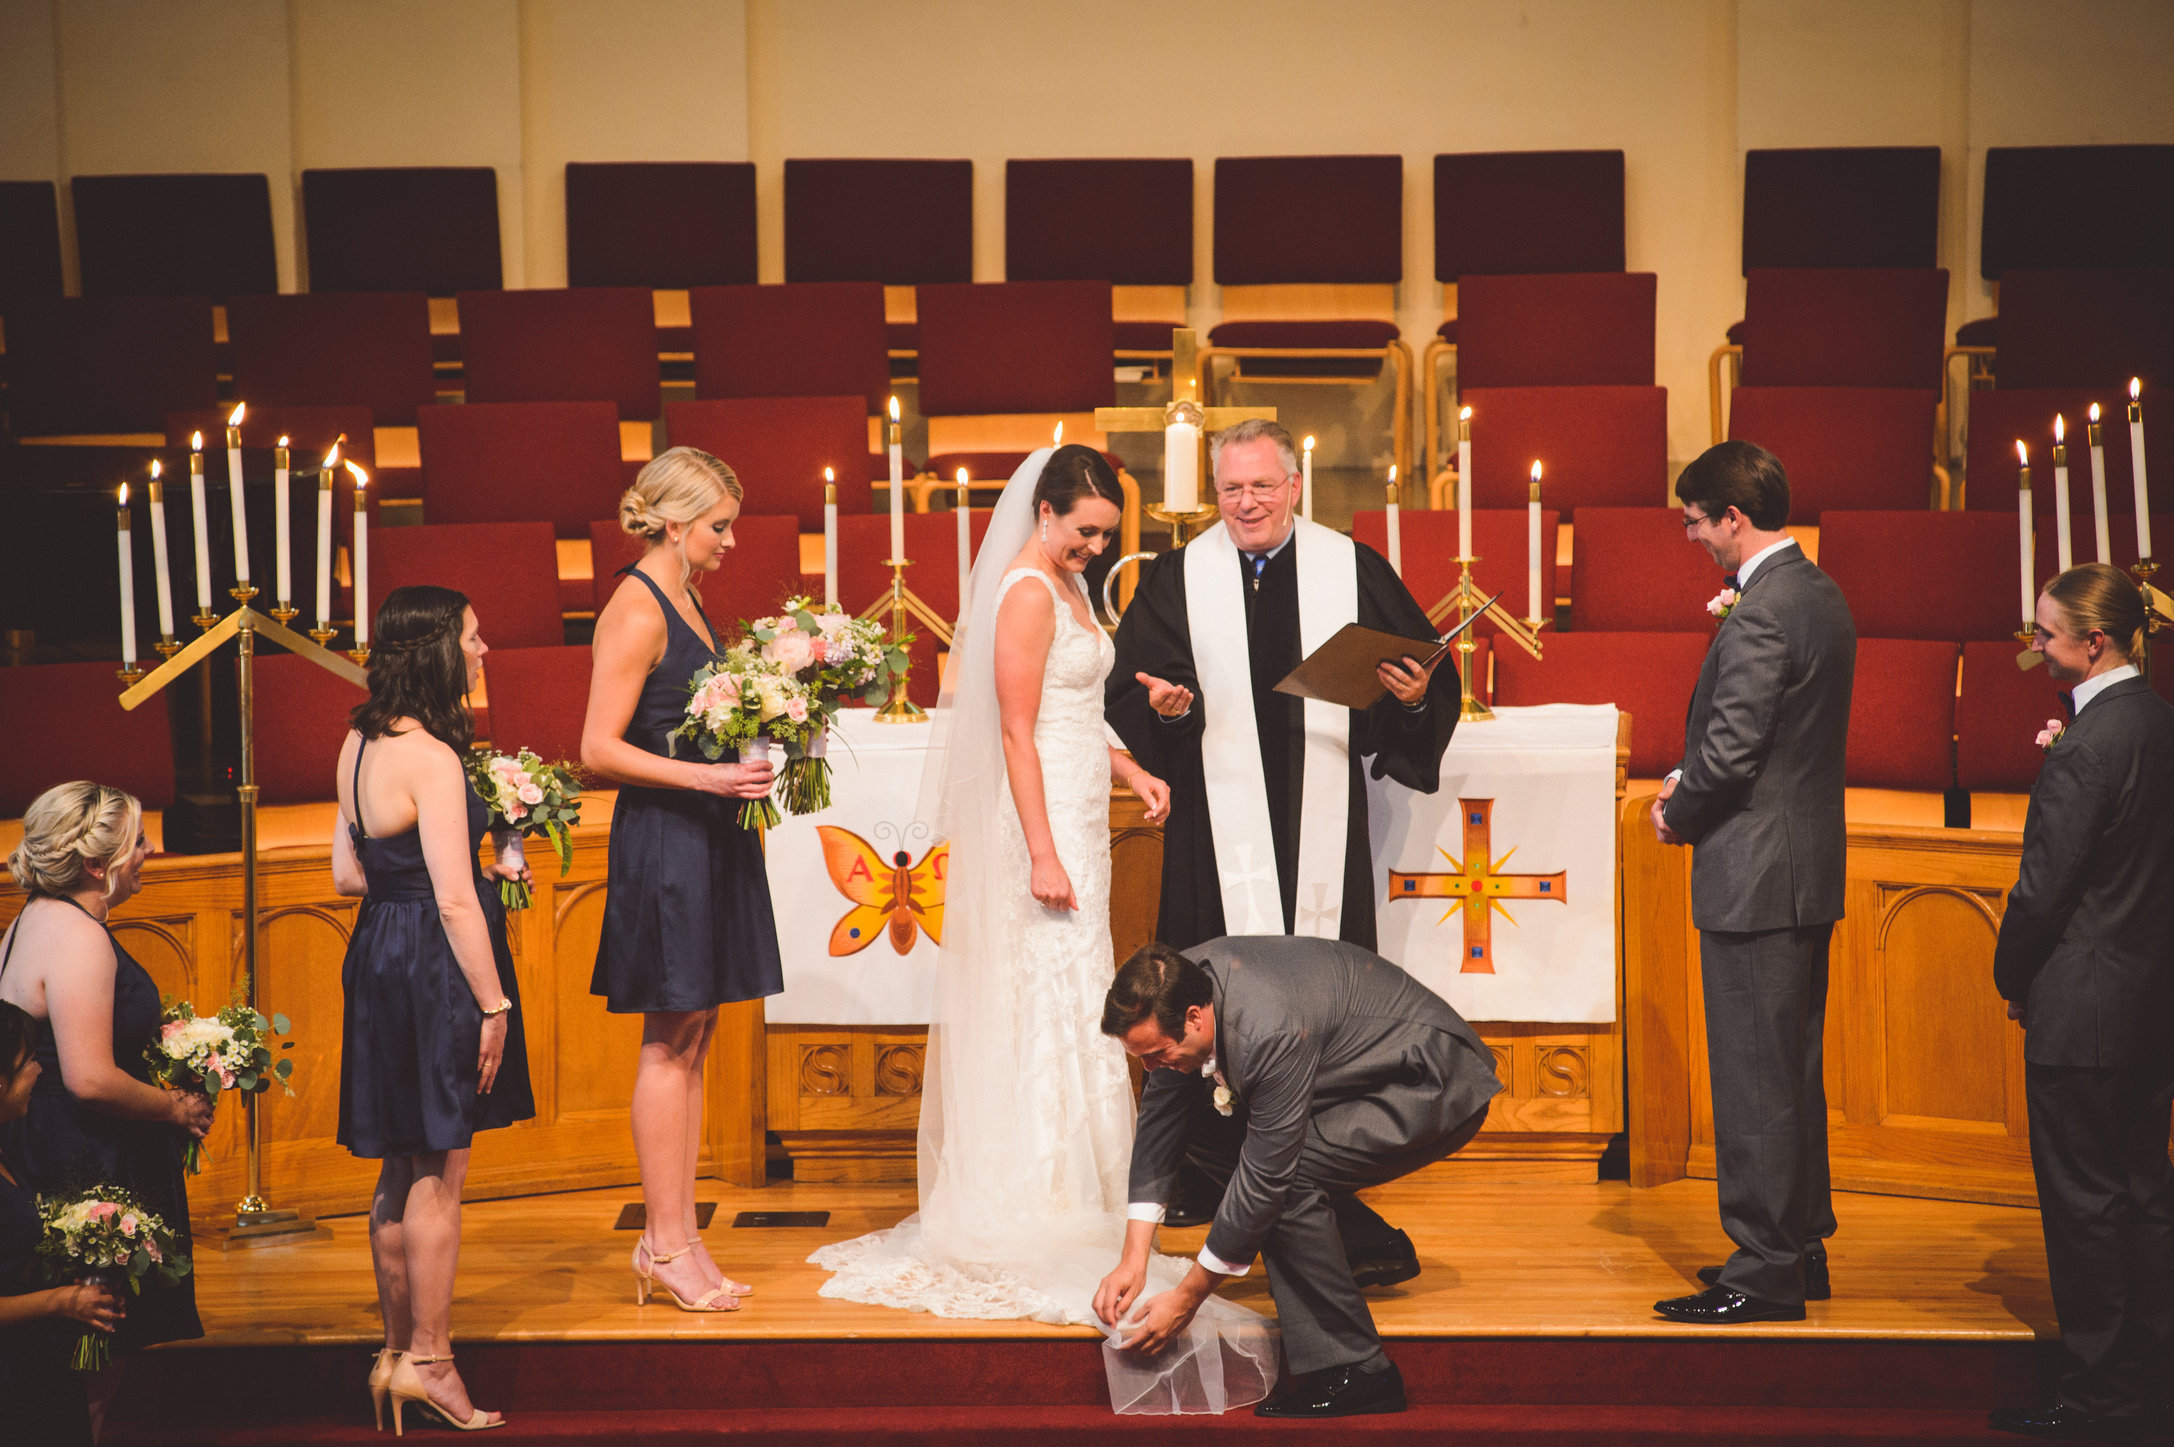 SandC-wedding-206.jpg